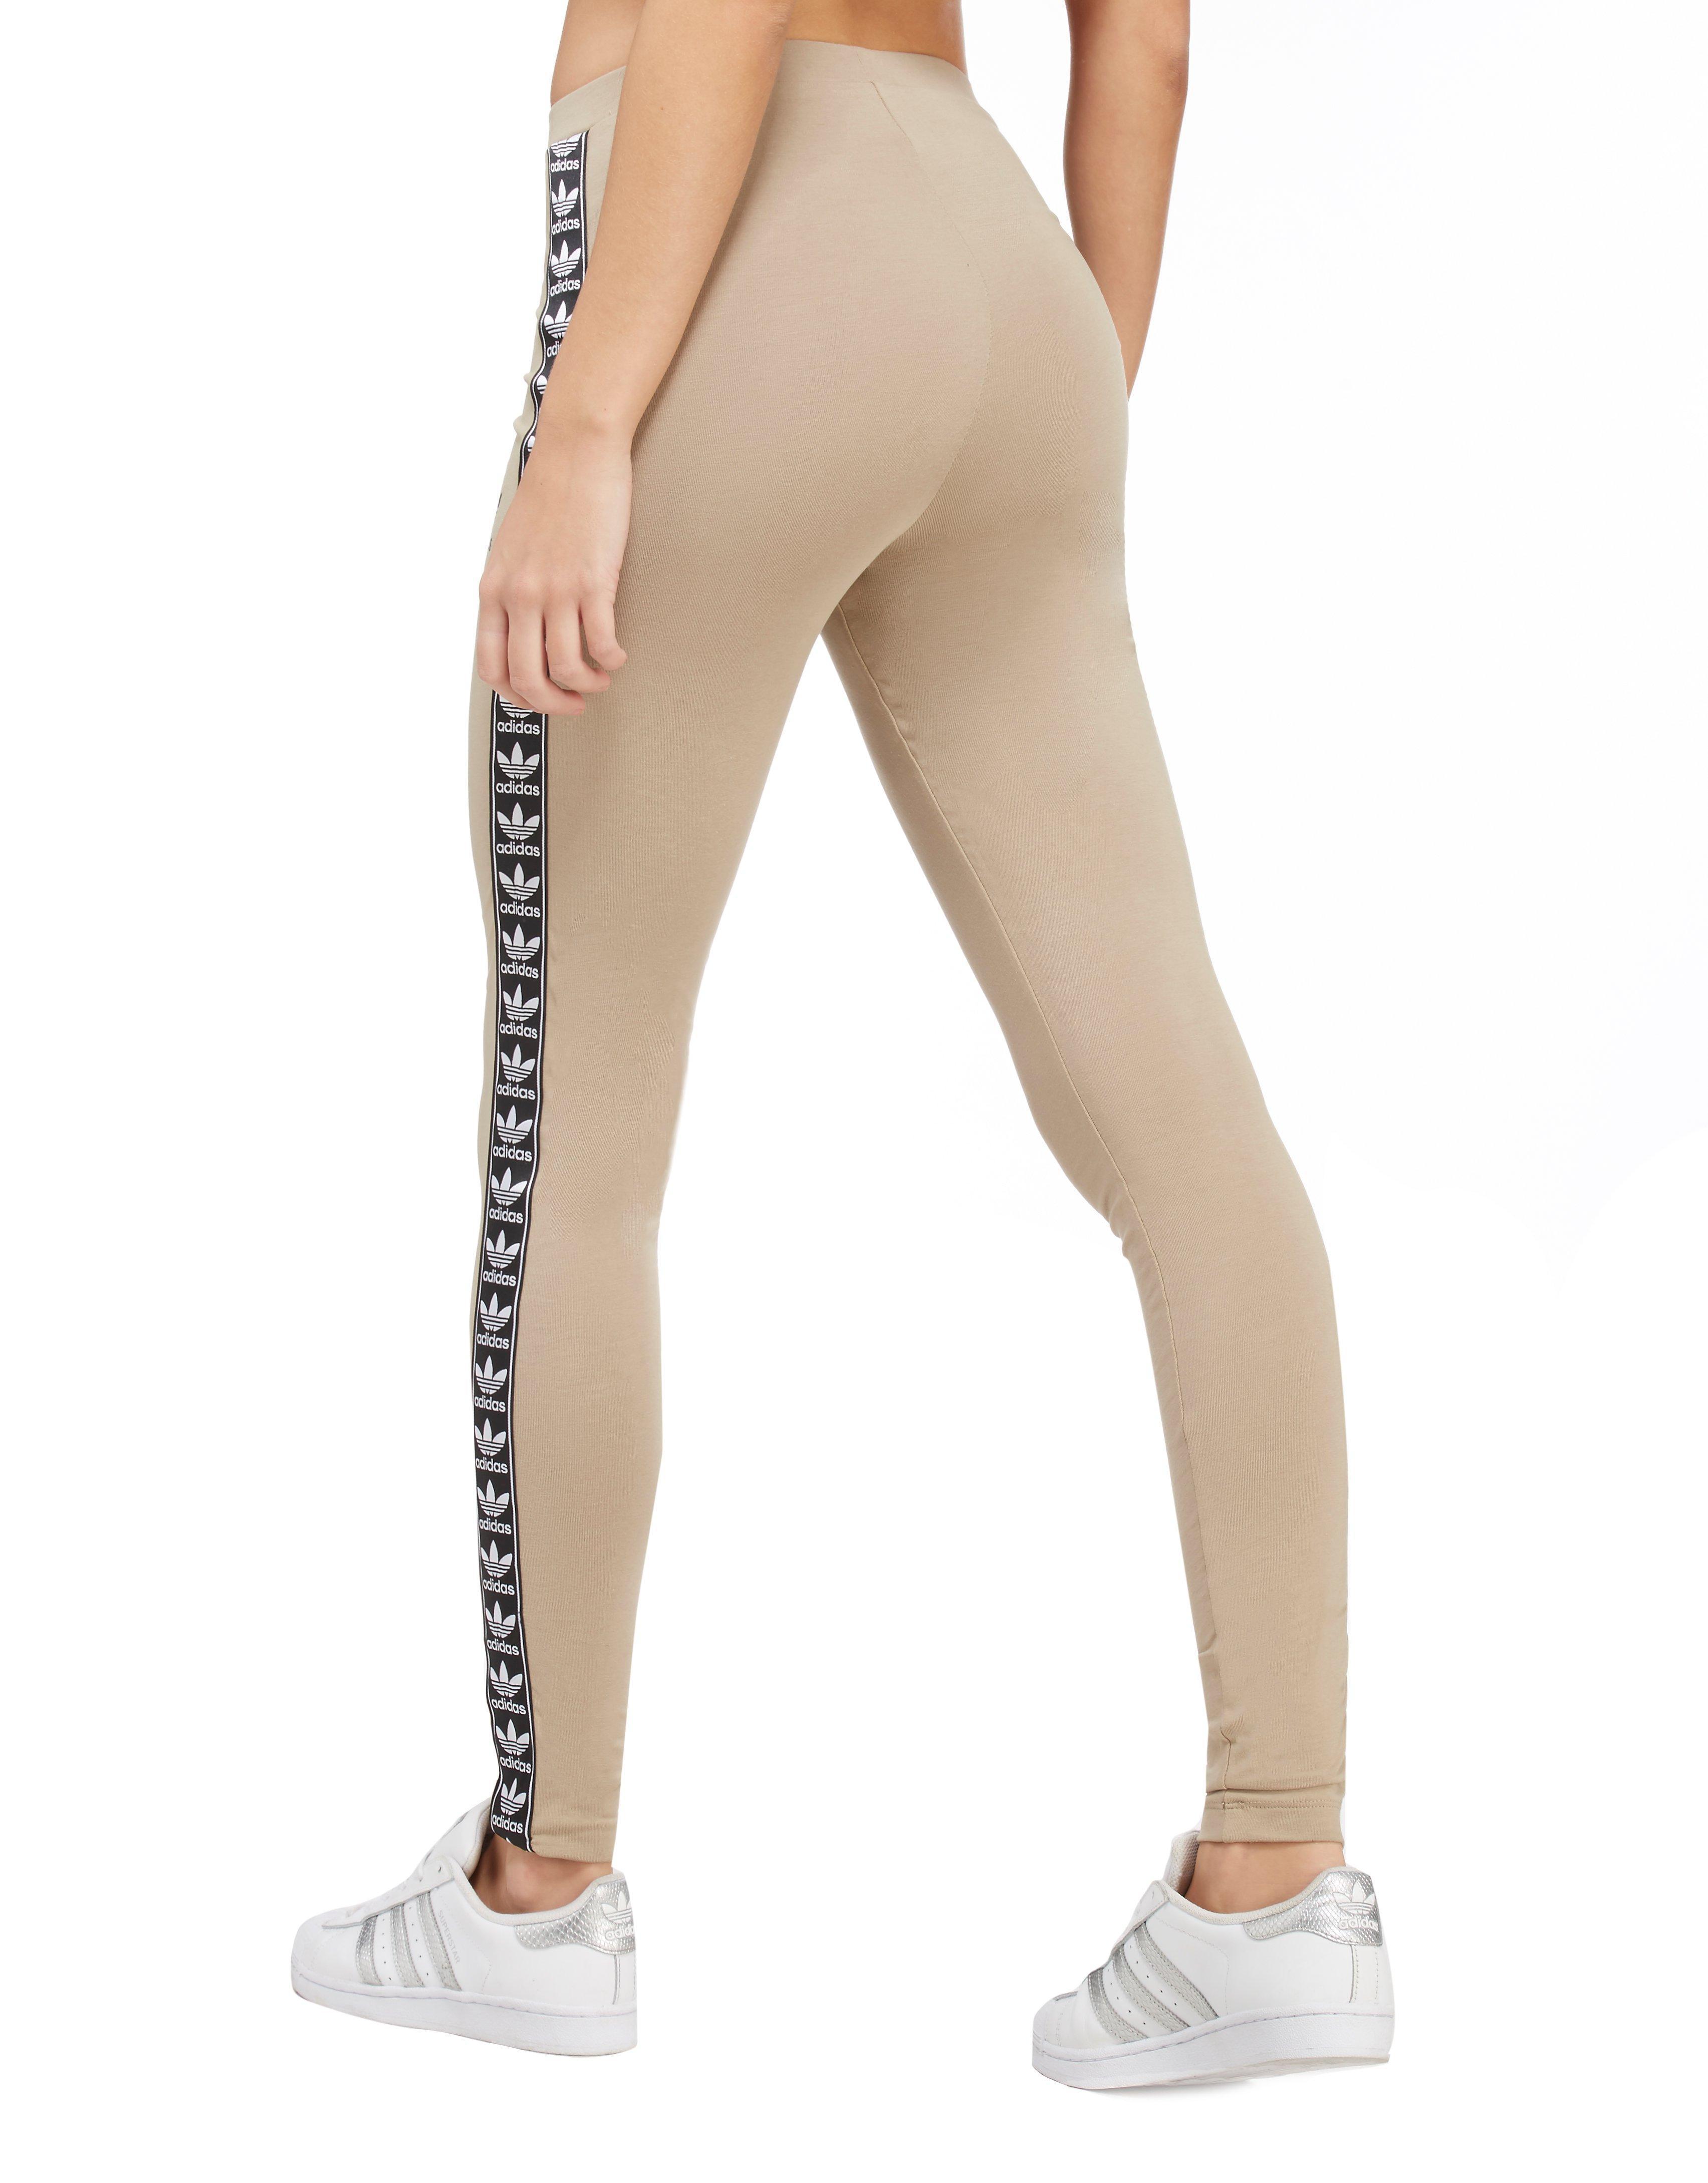 628db93728bab6 adidas Originals Tape Leggings in Natural - Lyst